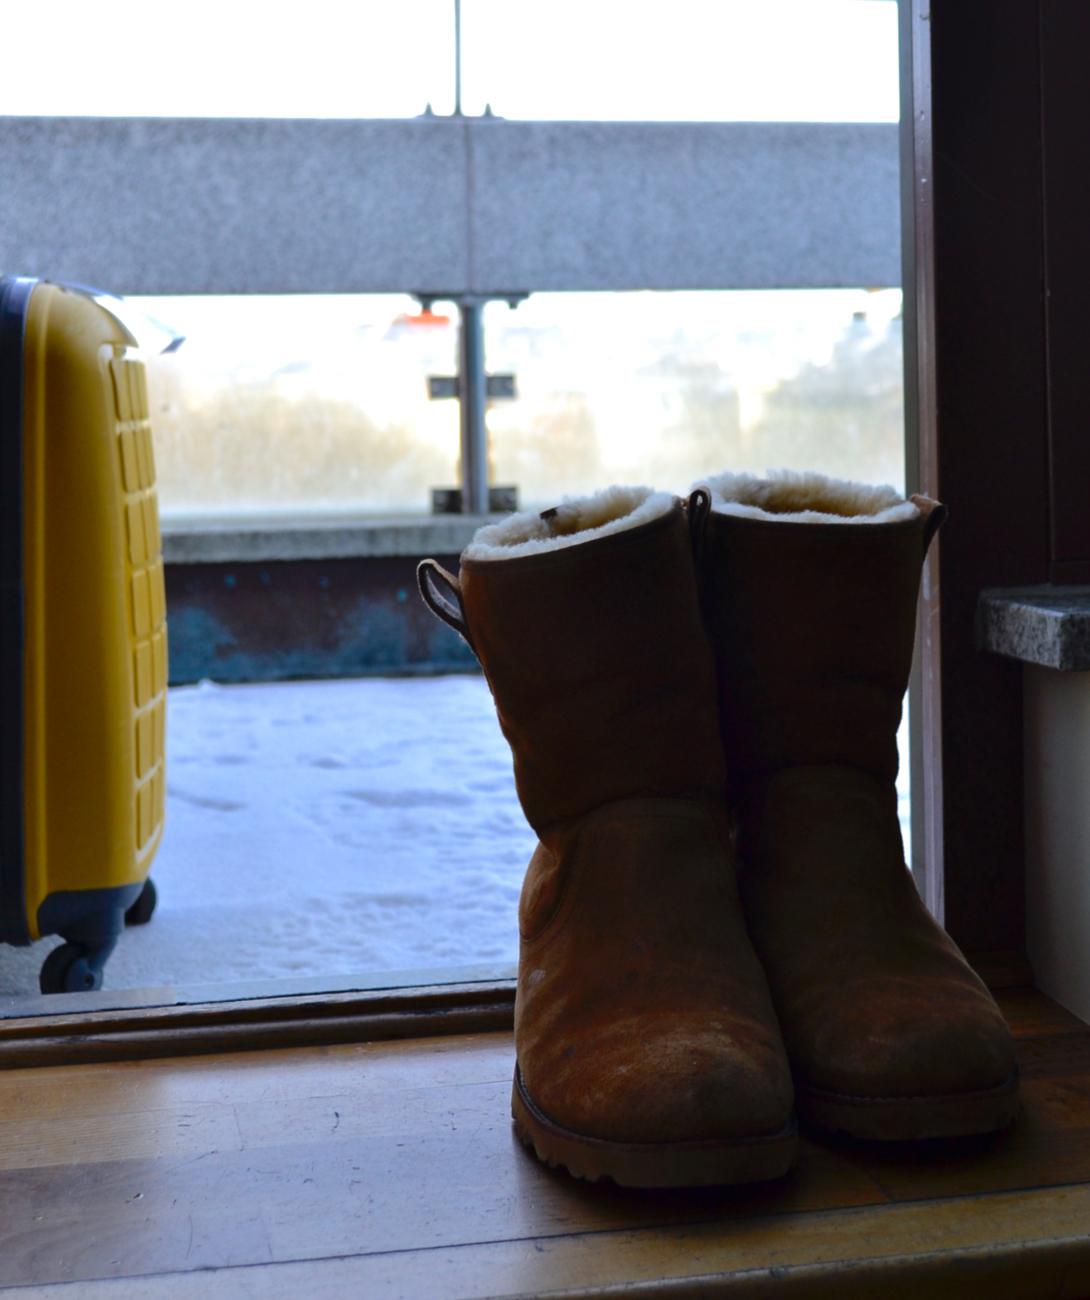 Ugg boots suitcase balcony Scandic Anglais Stockholm